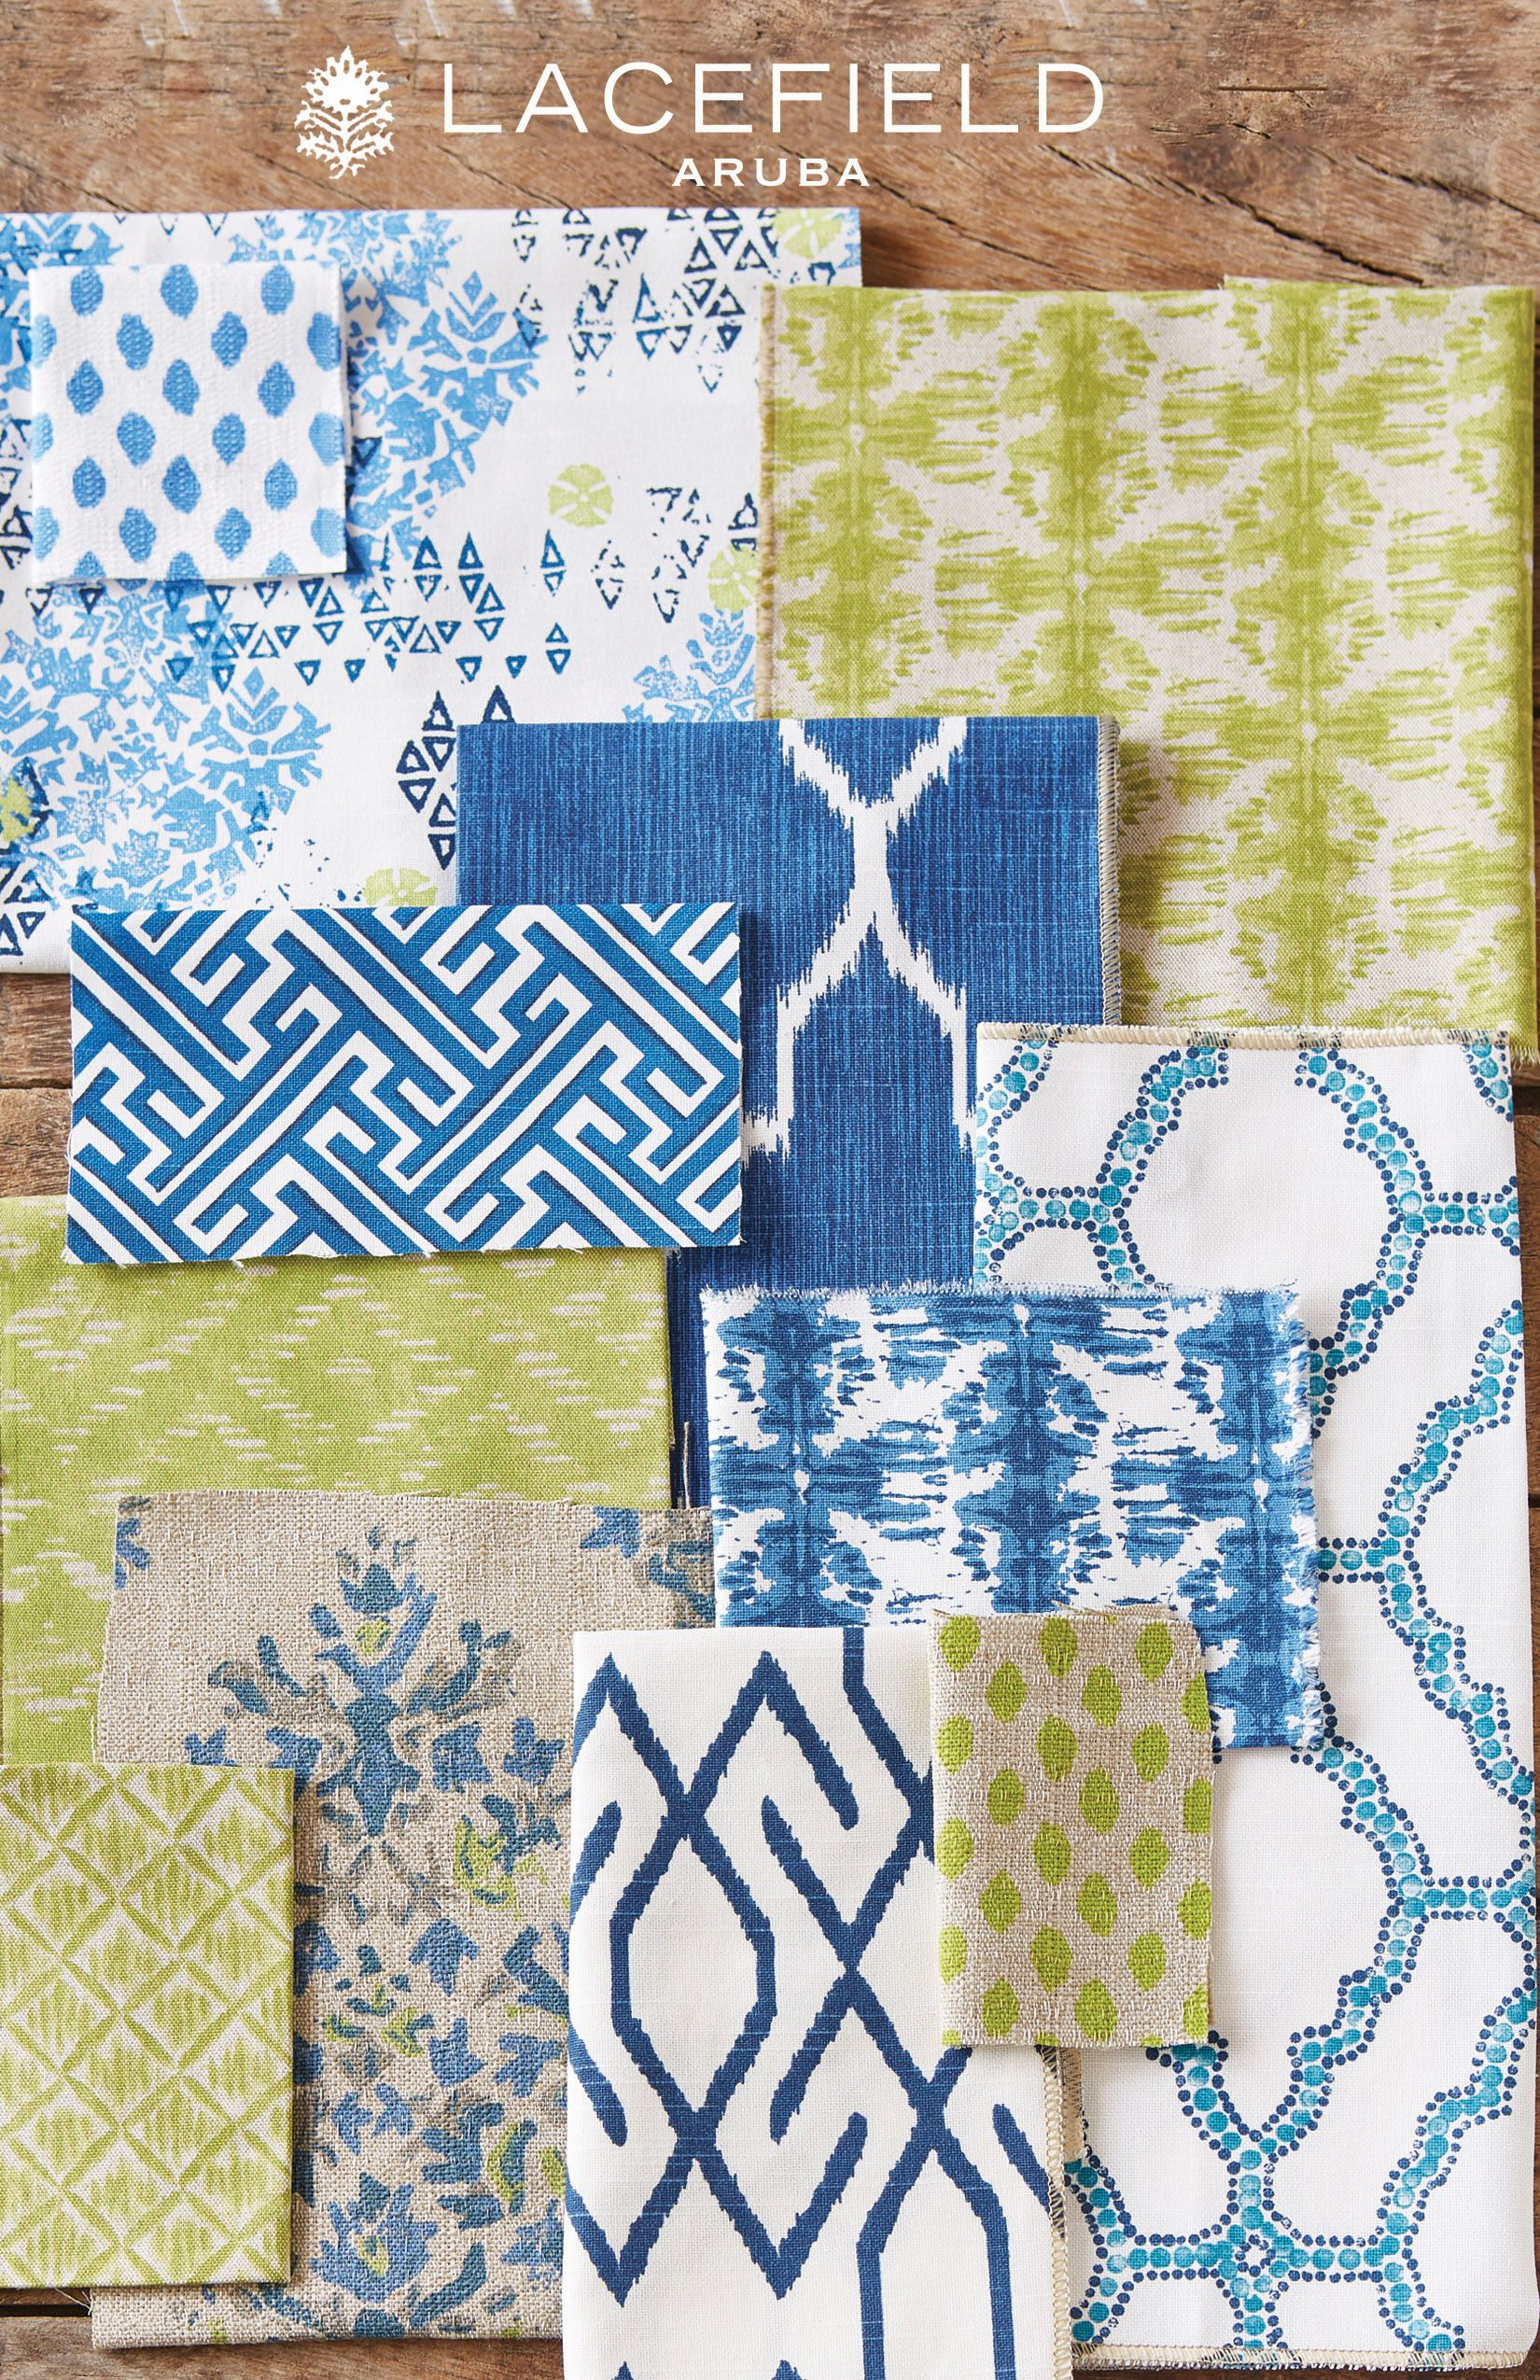 lacefield aruba 2015 textile collection textiledesigner. Black Bedroom Furniture Sets. Home Design Ideas